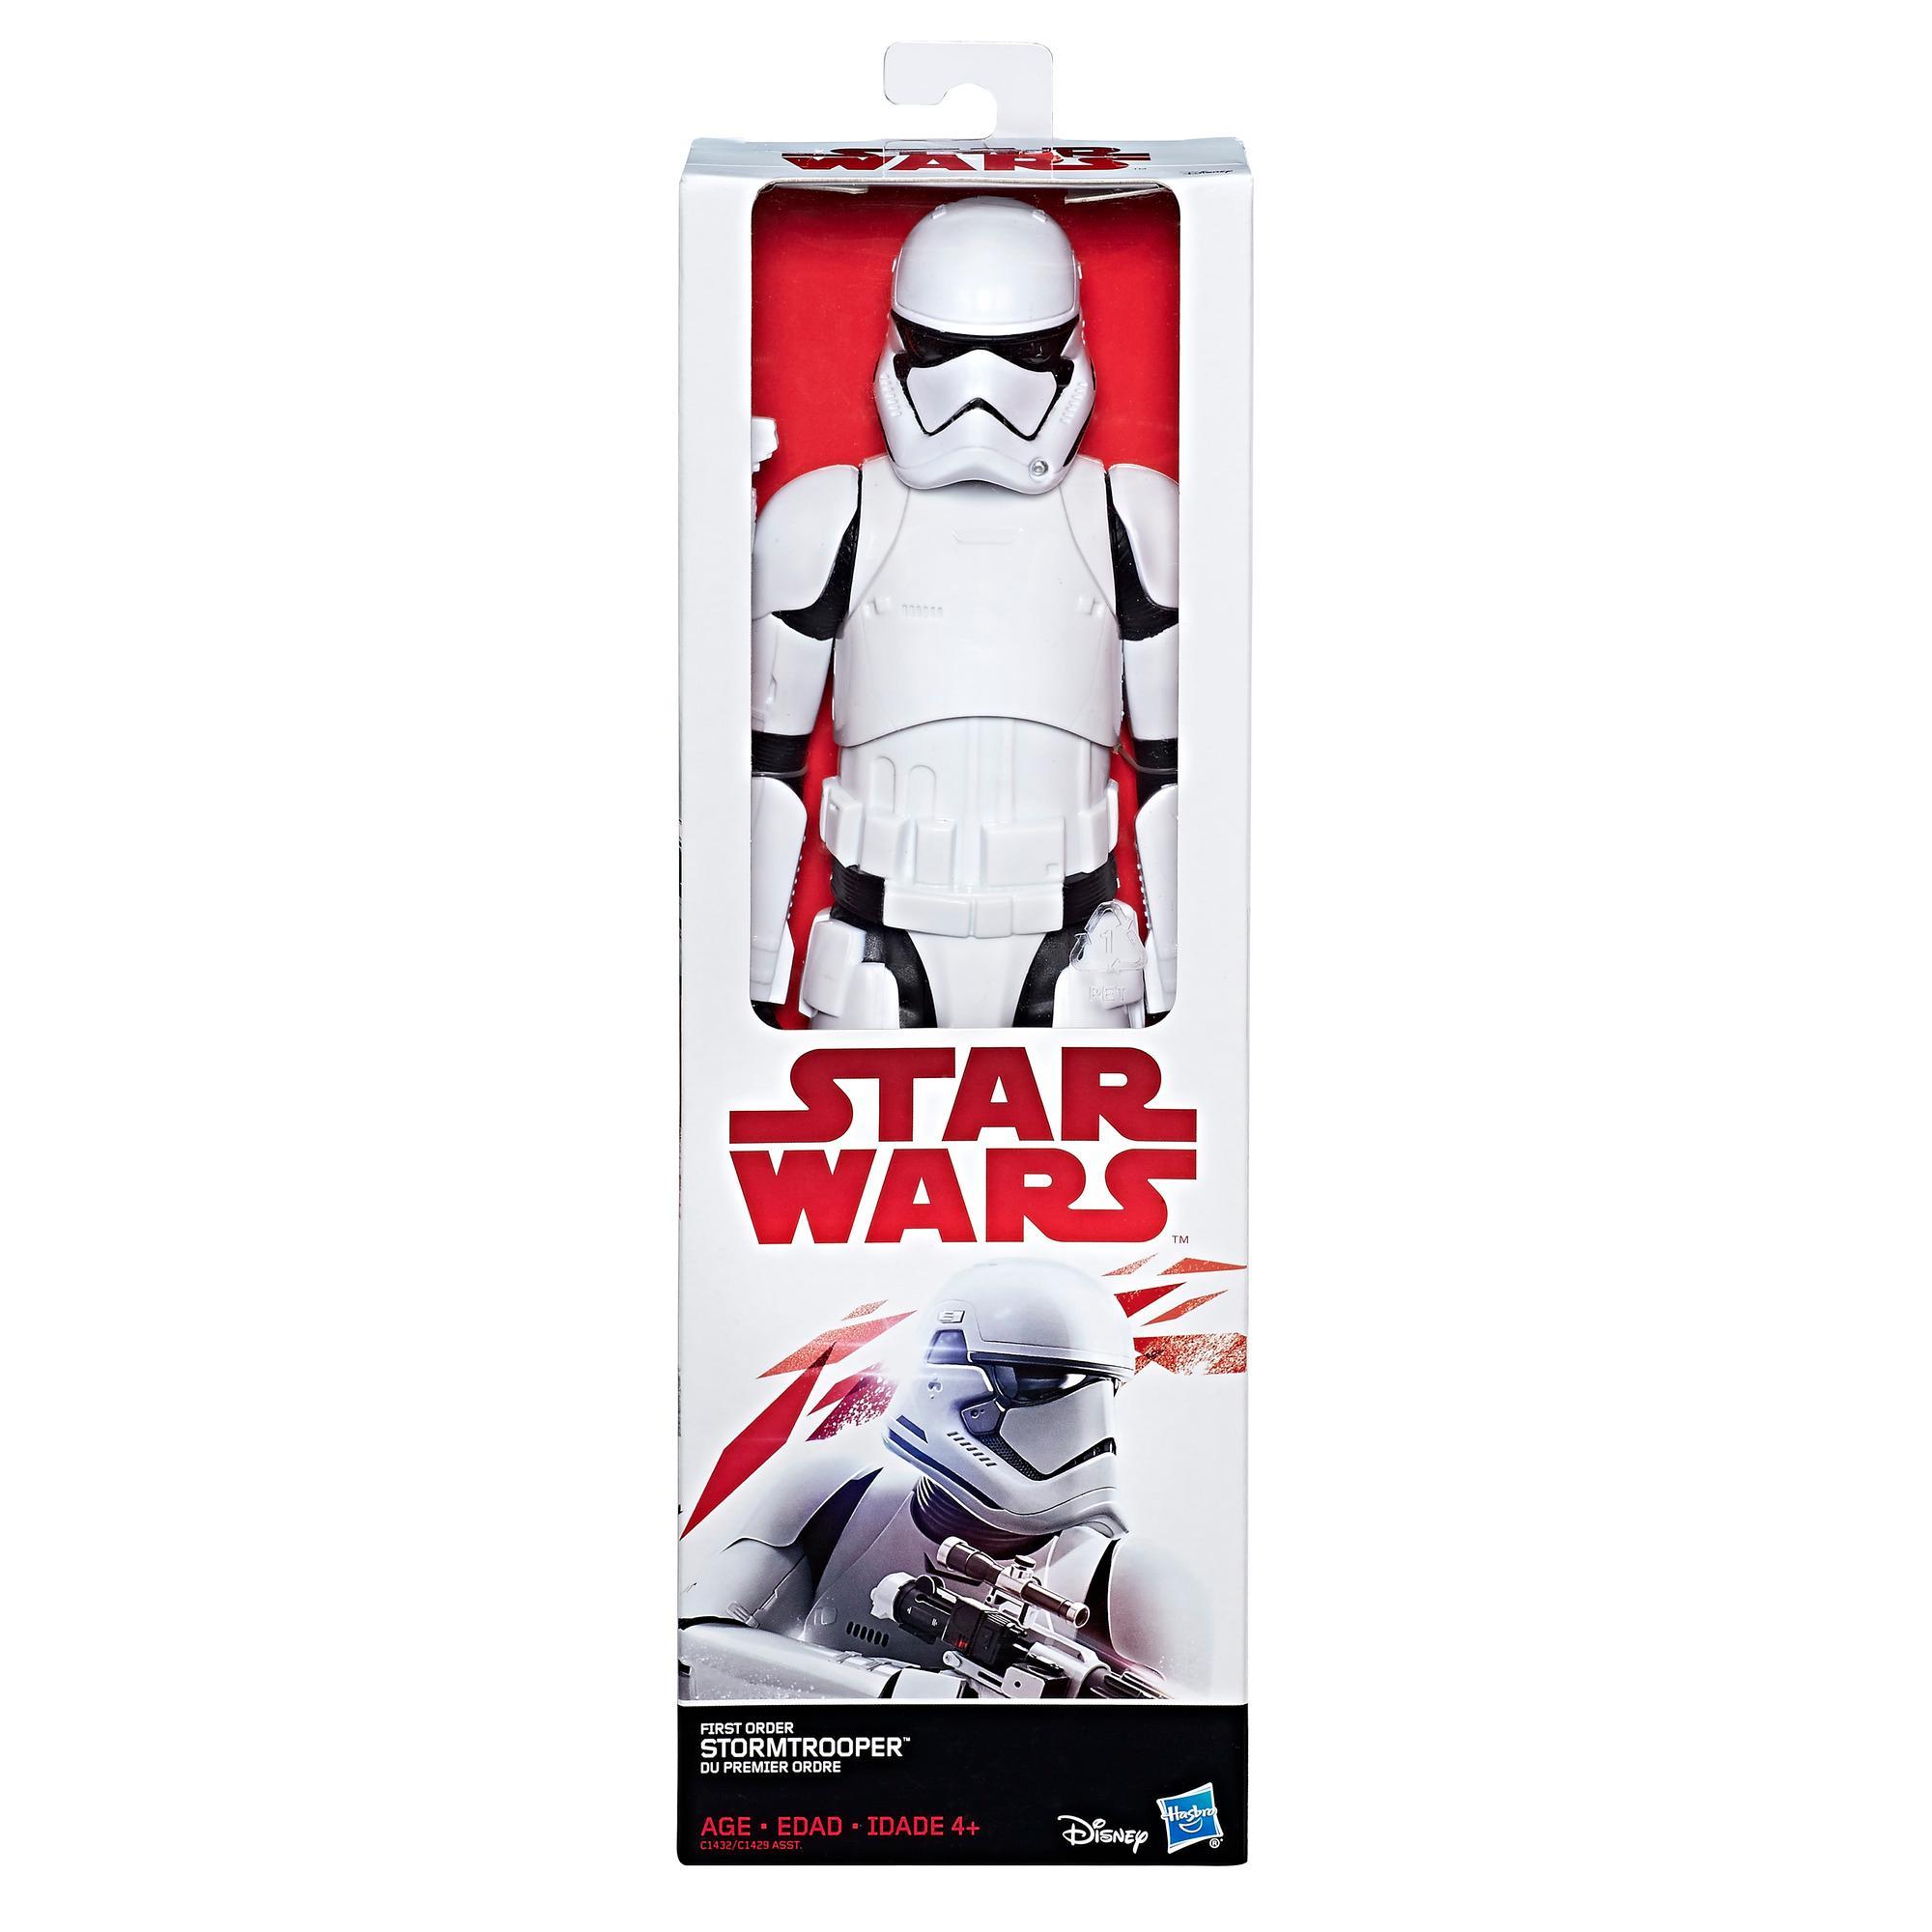 star wars the last jedi 12 inch first order stormtrooper. Black Bedroom Furniture Sets. Home Design Ideas